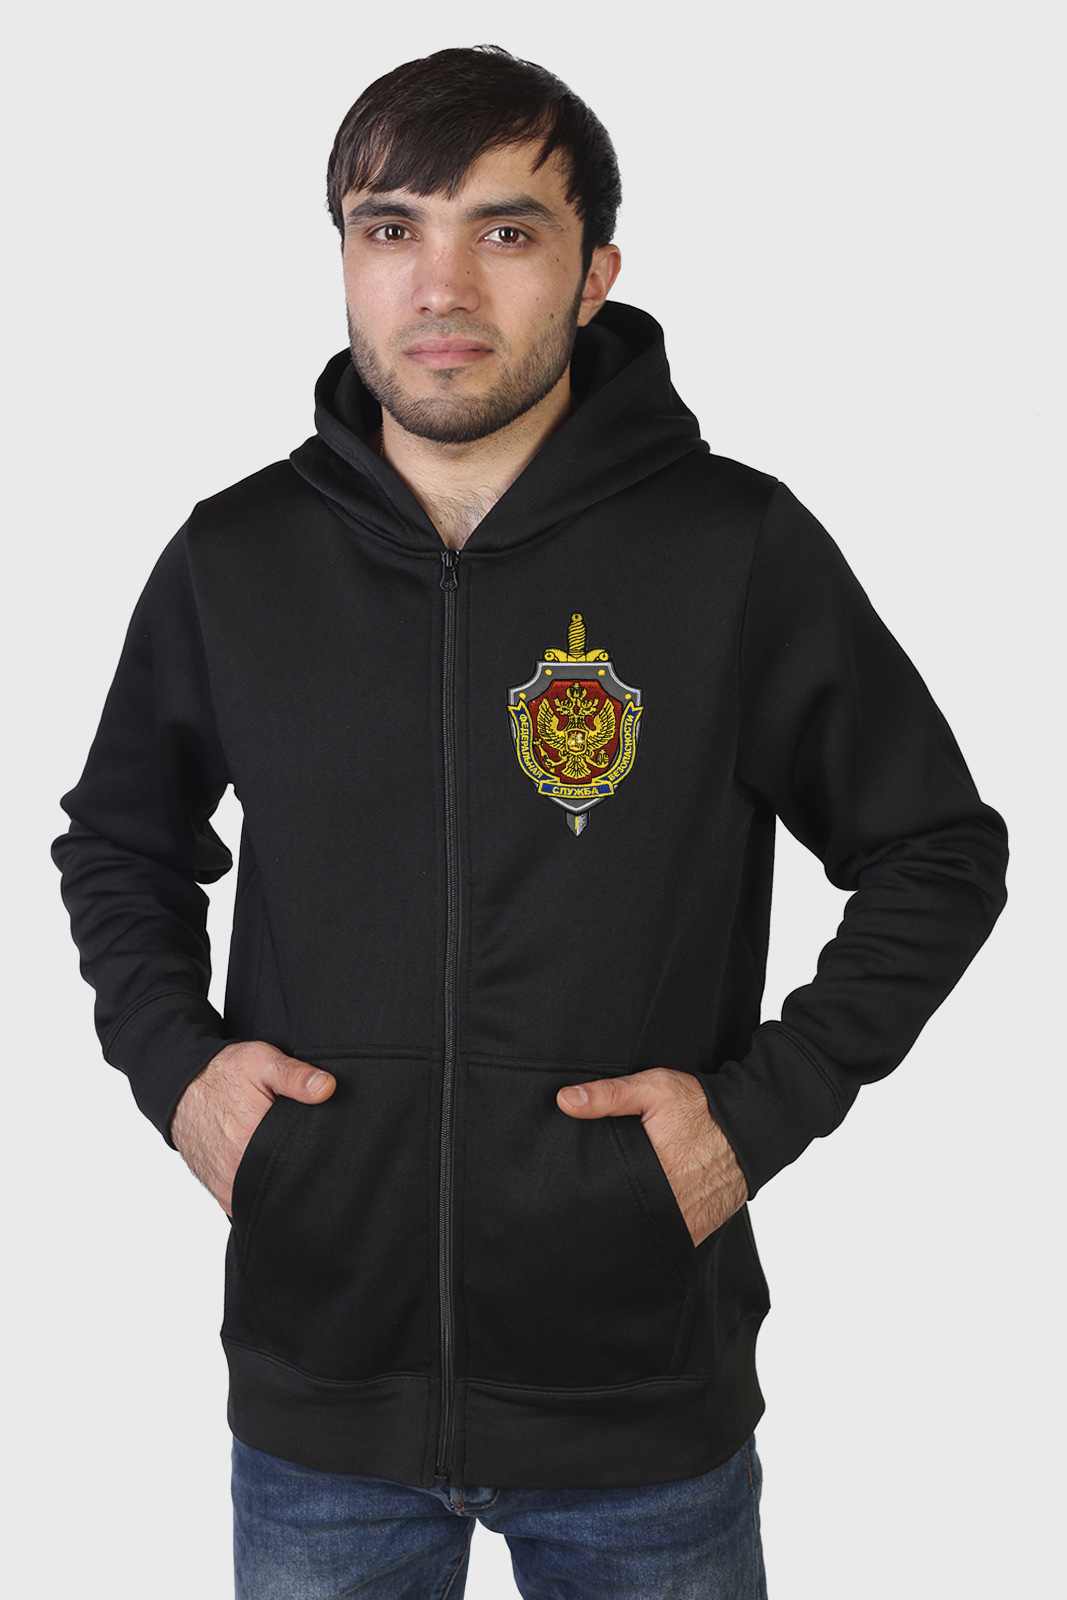 Мужская толстовка ФСБ с карманами